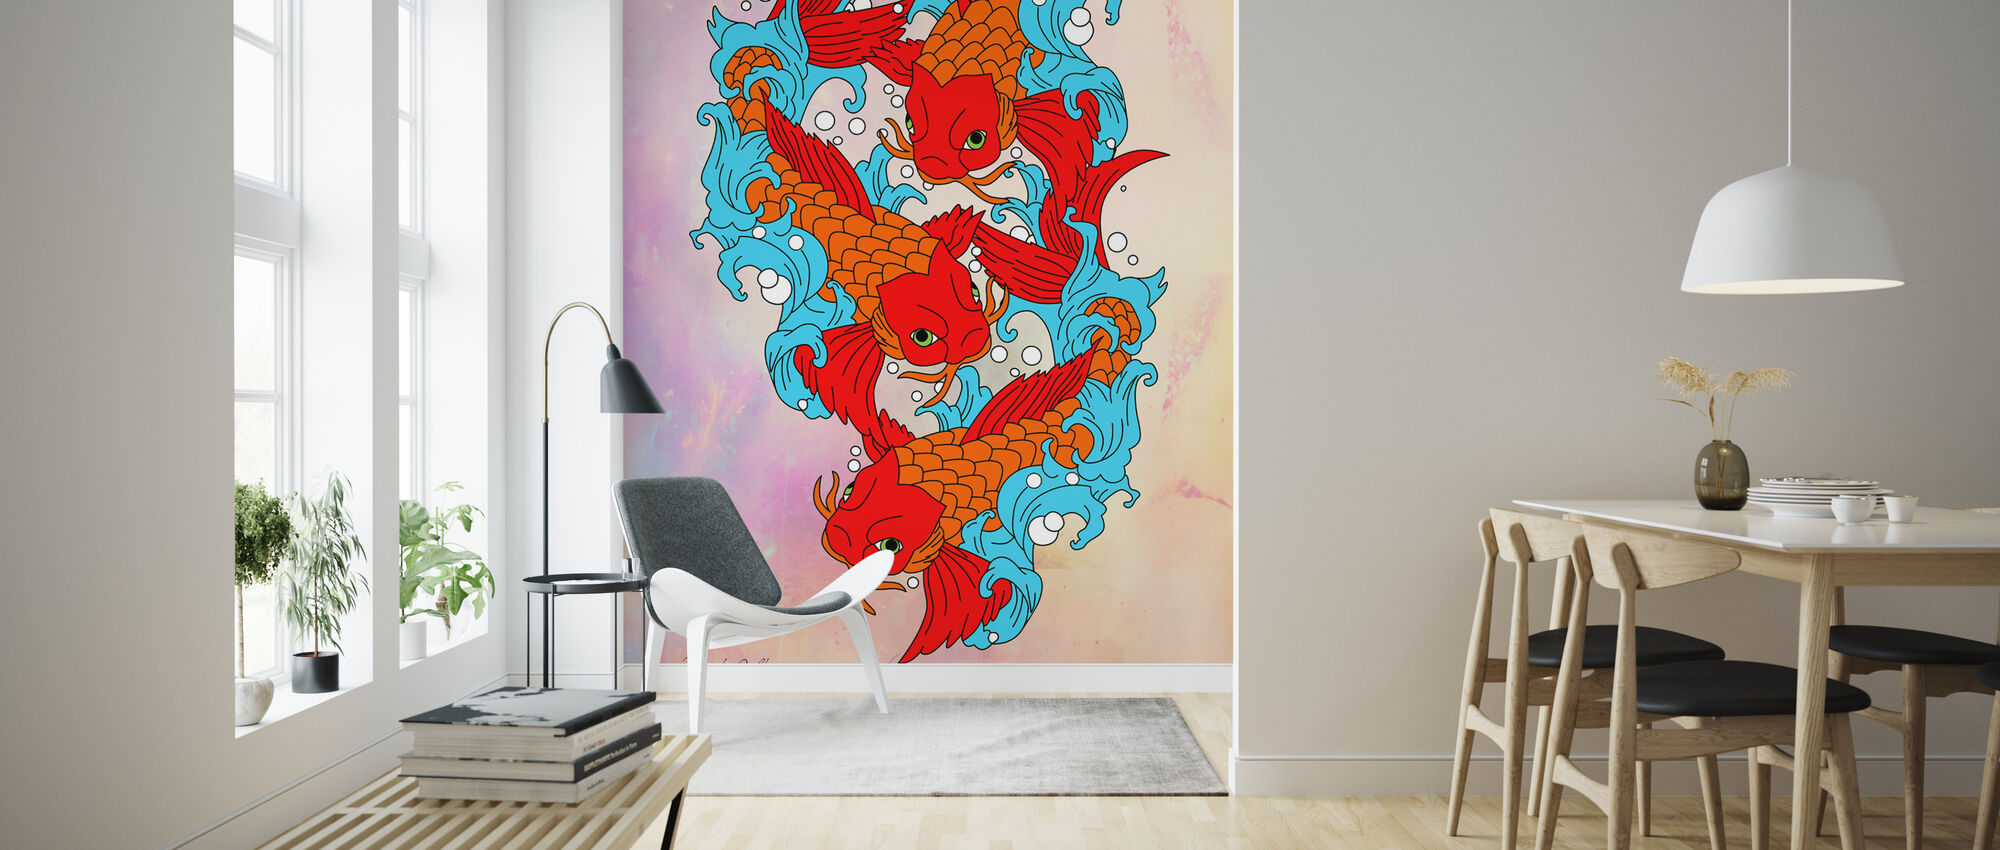 Koi Fish - Wallpaper - Living Room